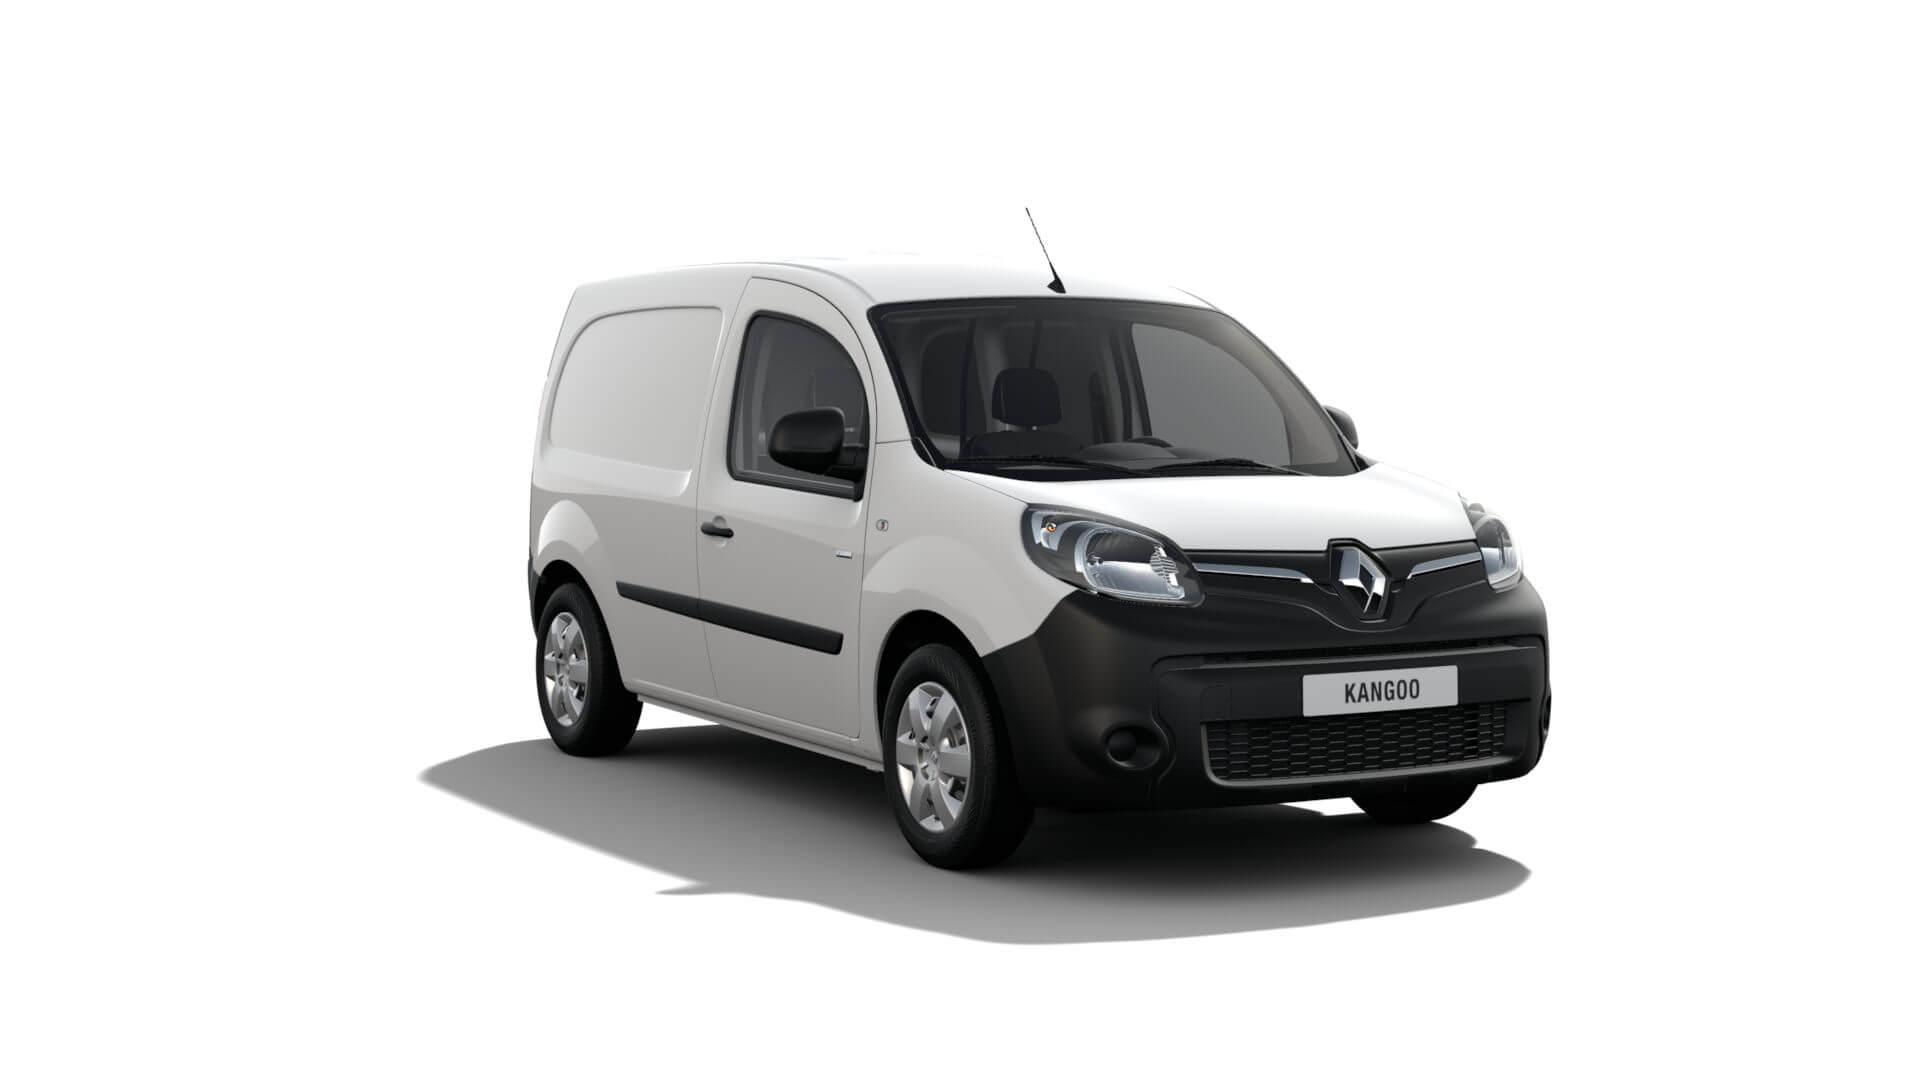 Automodell weiß - Renault Kangoo NFZ - Renault Ahrens Hannover